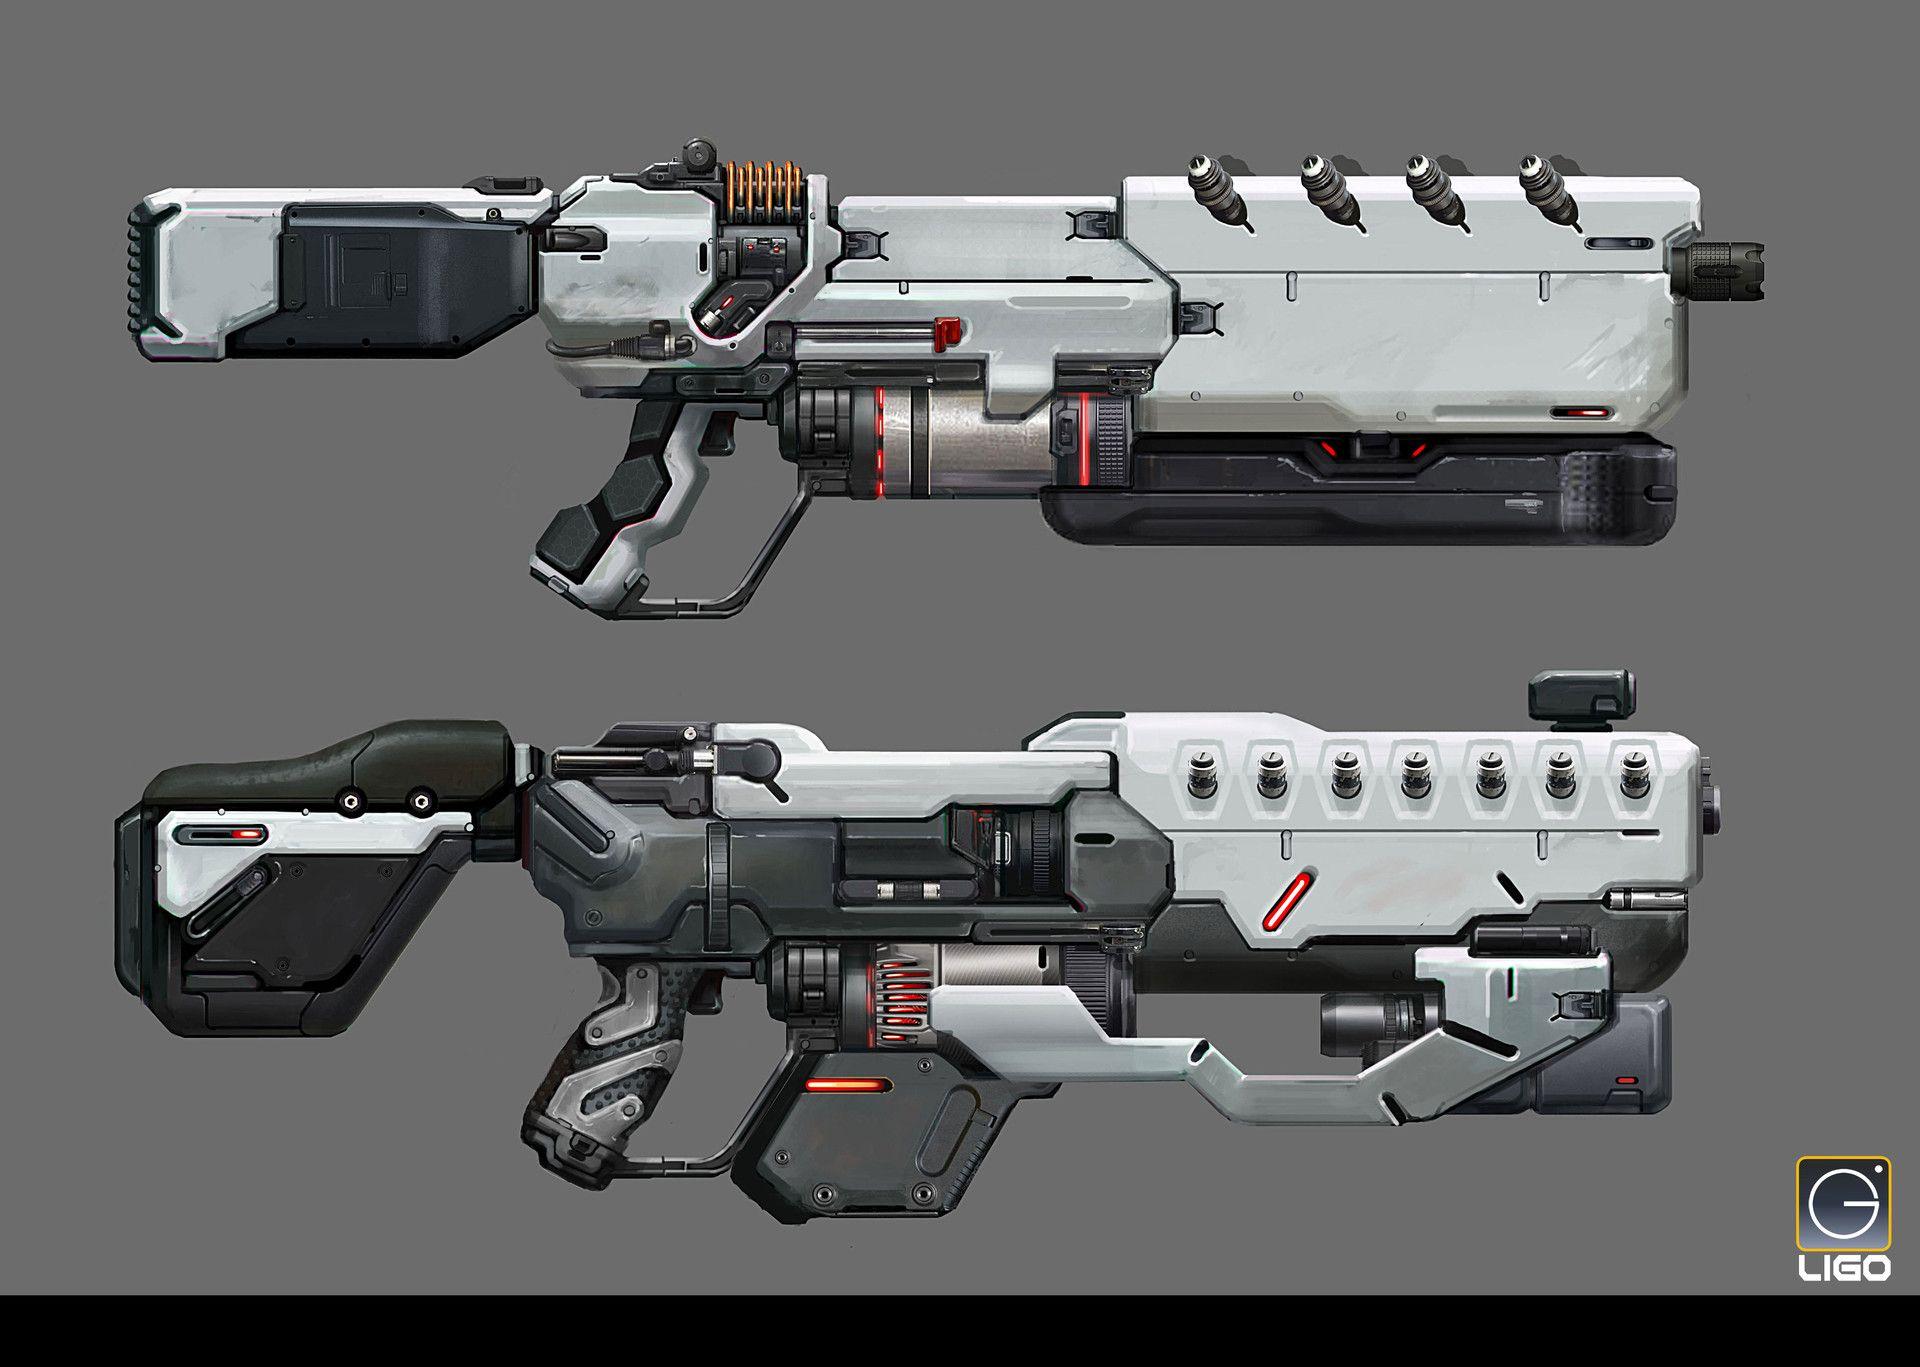 ArtStation - Assault rifle Design for the RISING FIRE, Jay ...